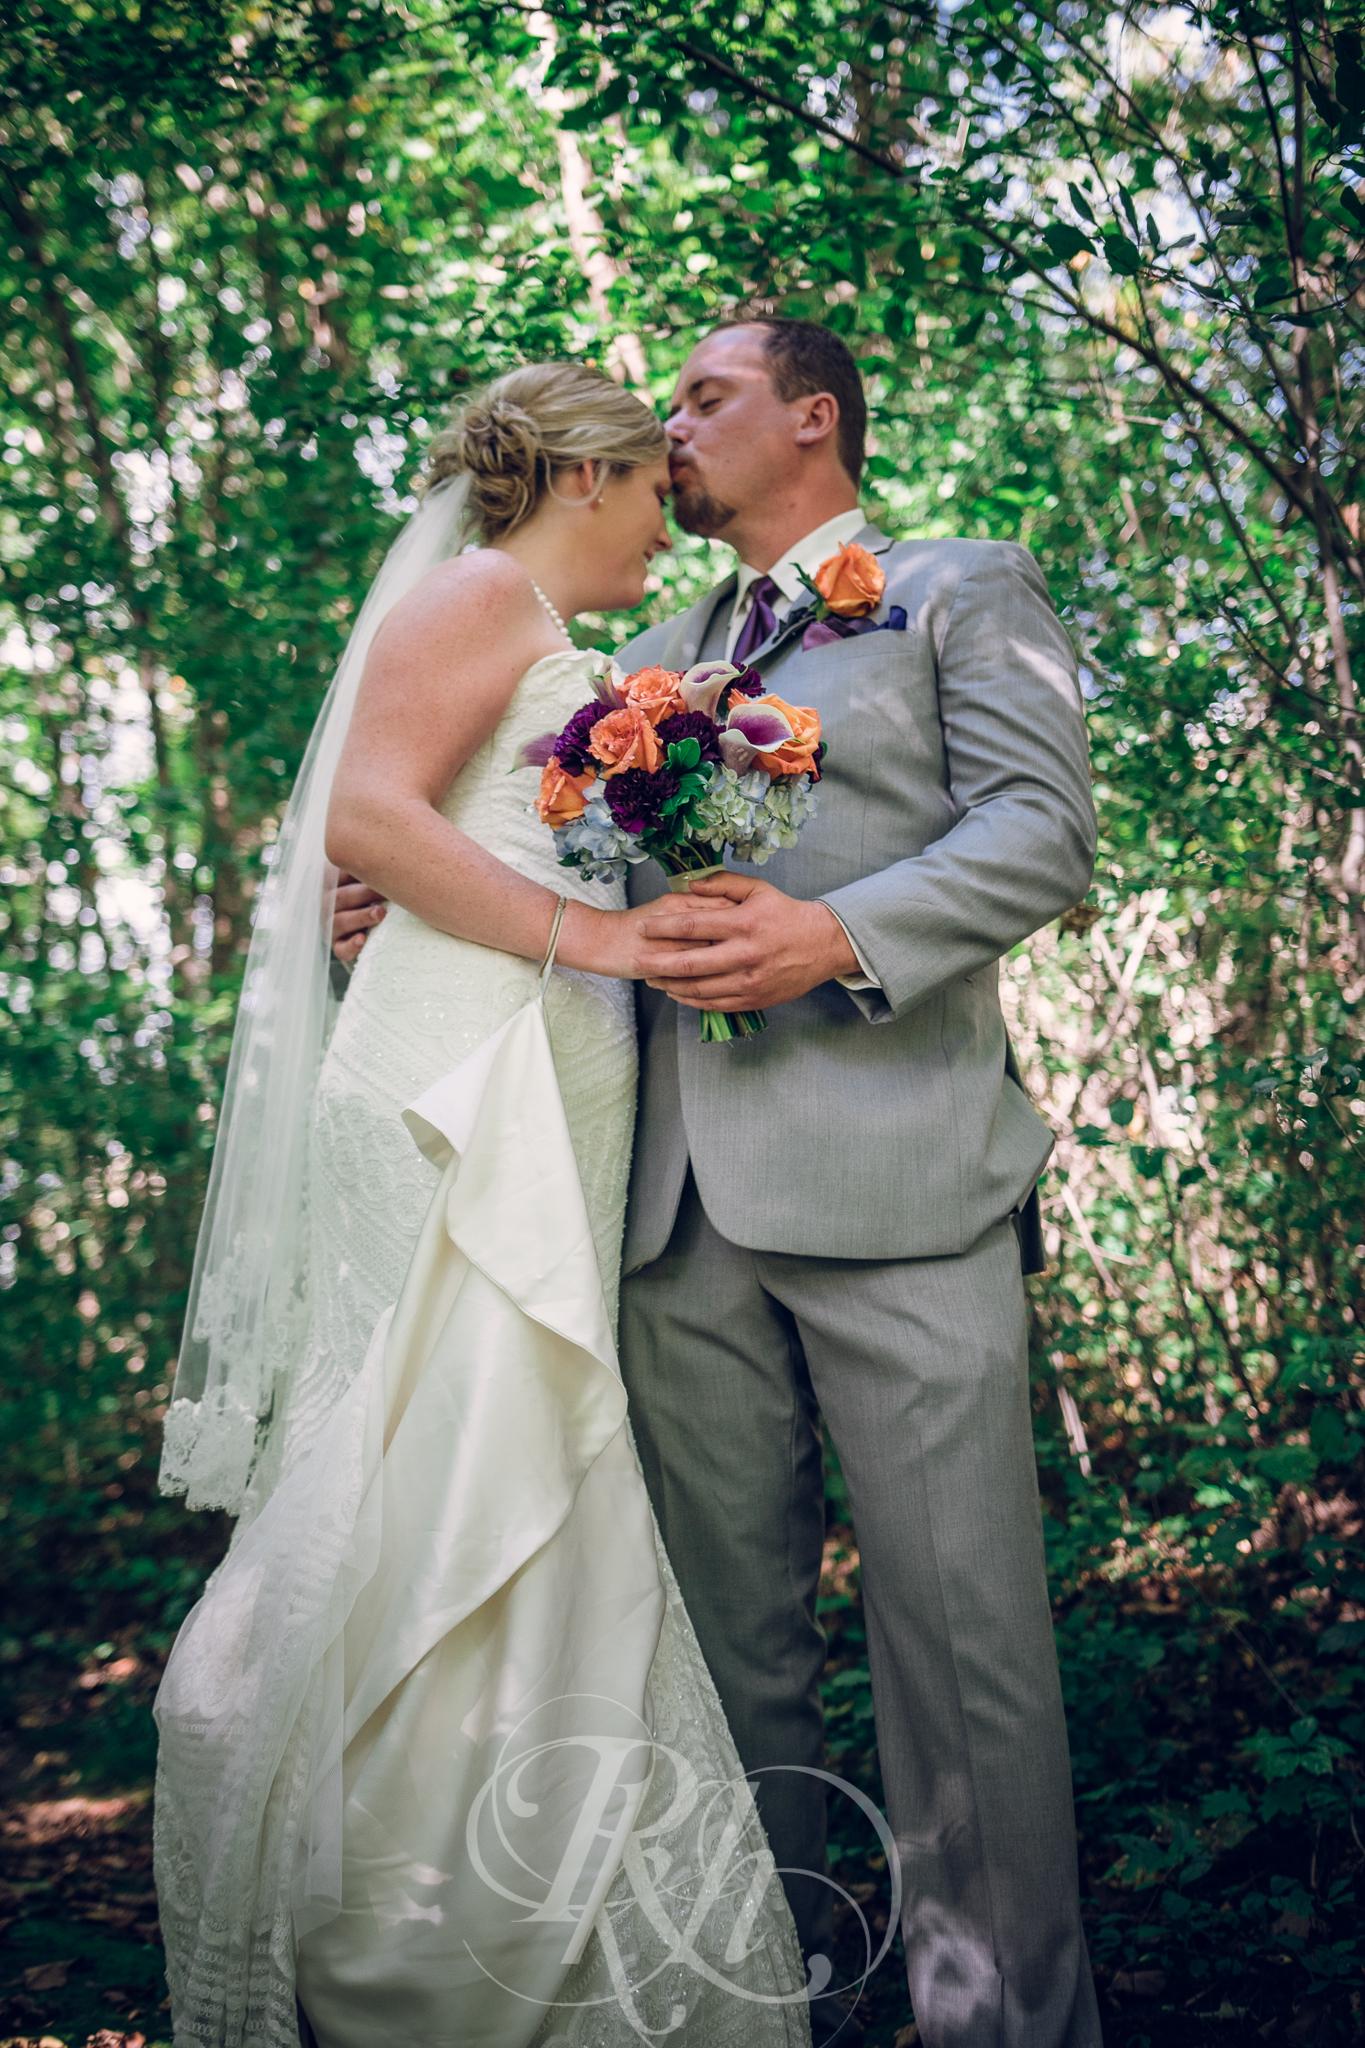 Jackie & Corey - Minnesota Wedding Photography - RKH Images -10.jpg